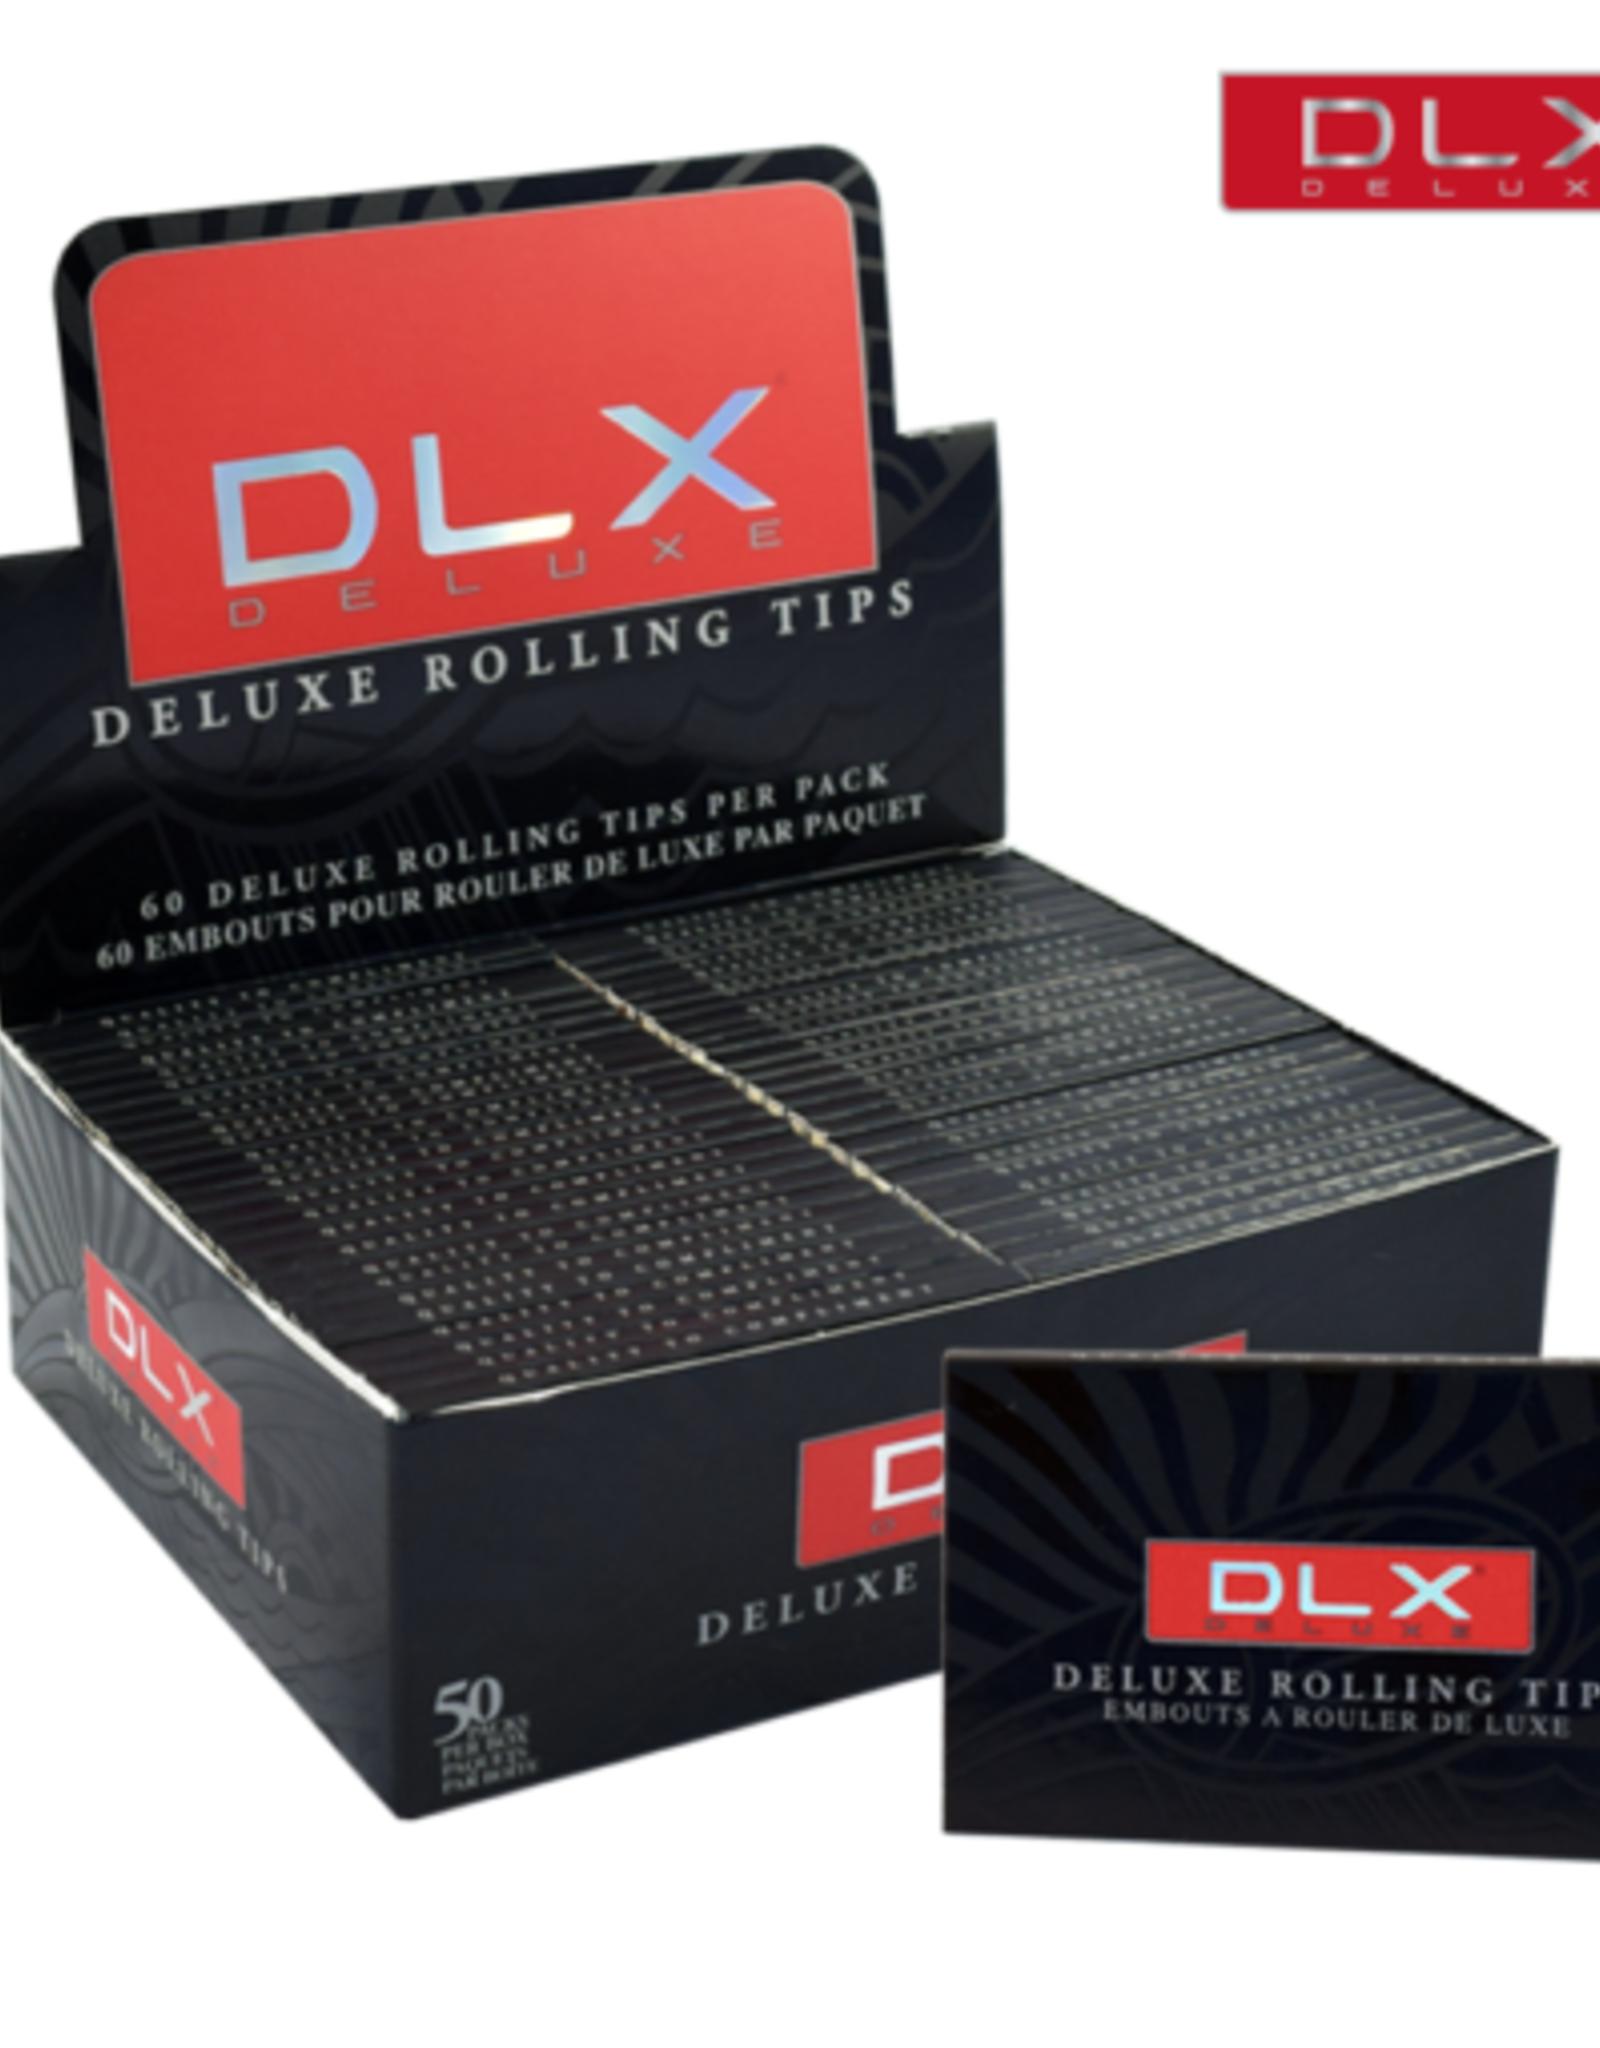 DLX Tips